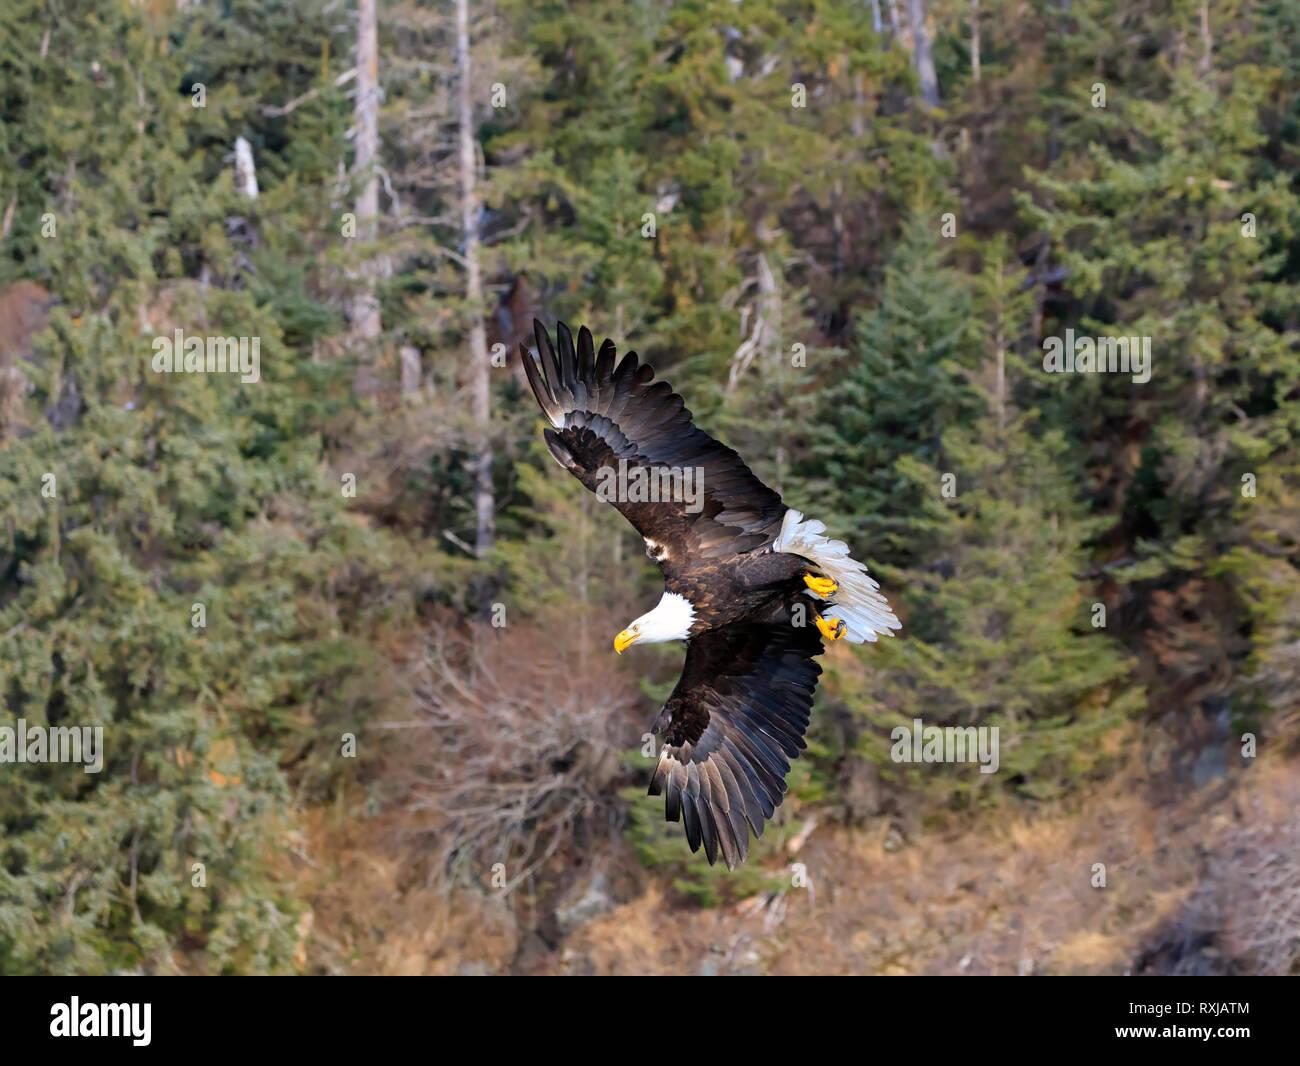 Bald eagle, Haliaeetus leucocephalus, in flight - Stock Image